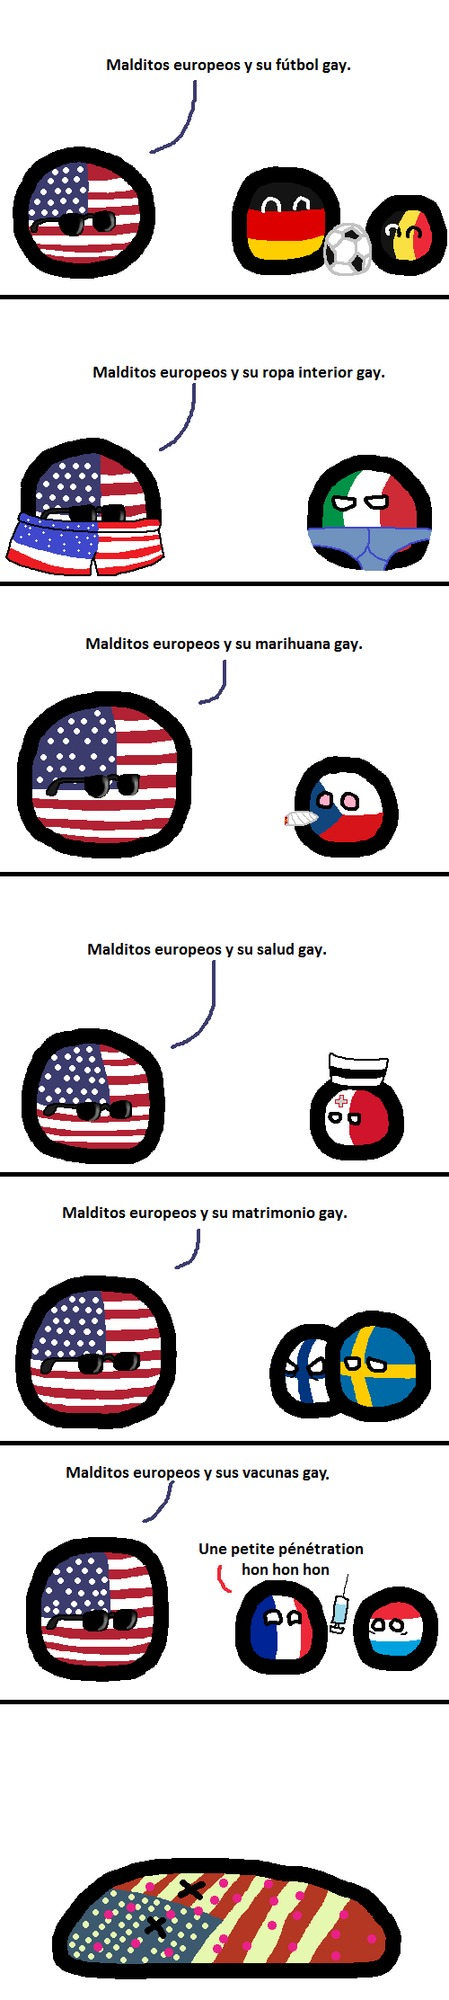 malditos europeos geis :darkstare: - meme